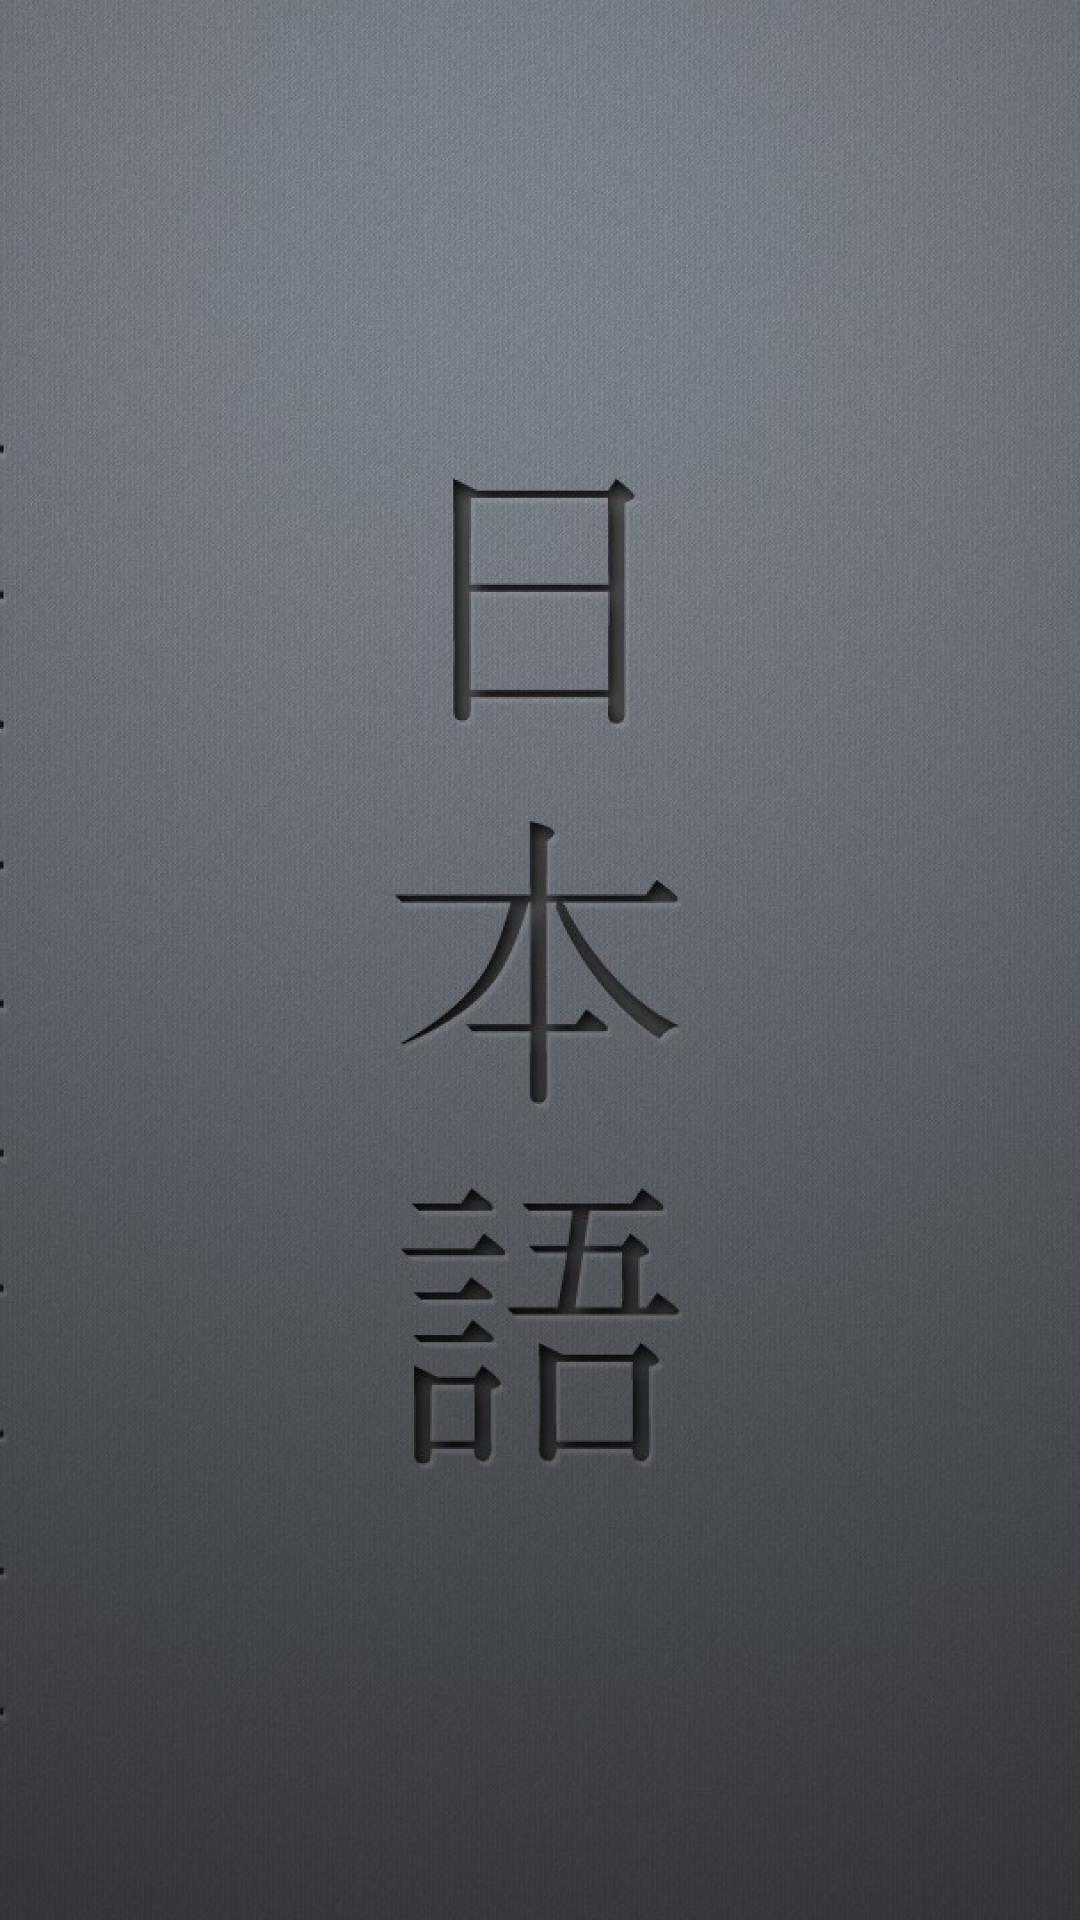 Minimalist Iphone Wallpaper Japanese